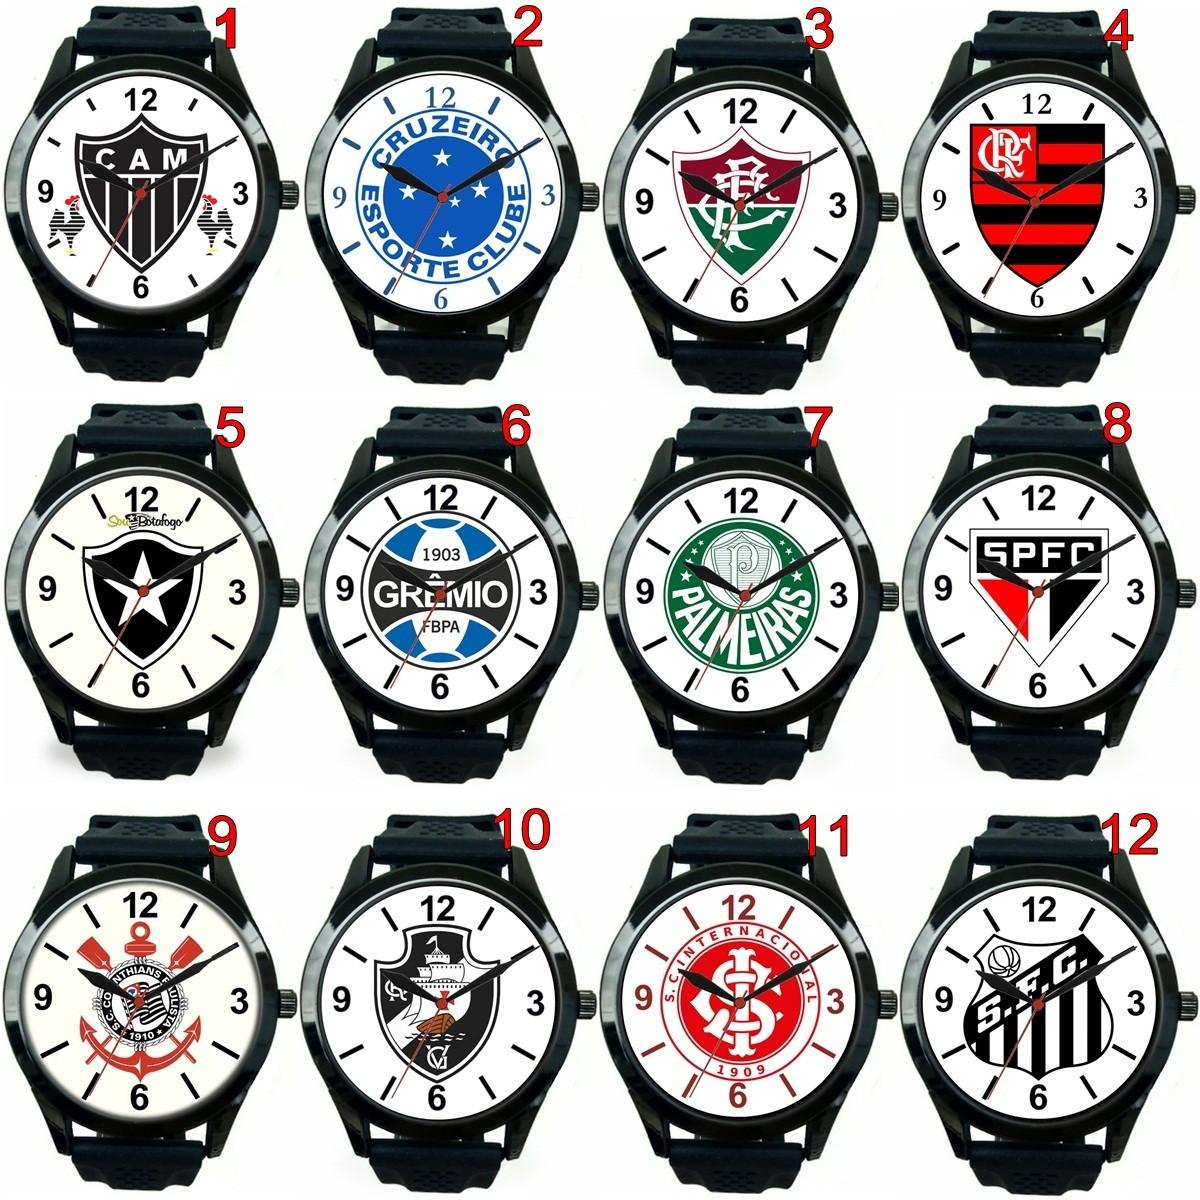 3d16d339fcd Relógio pulso esportivo personalizado times futebol barato no Elo7 ...